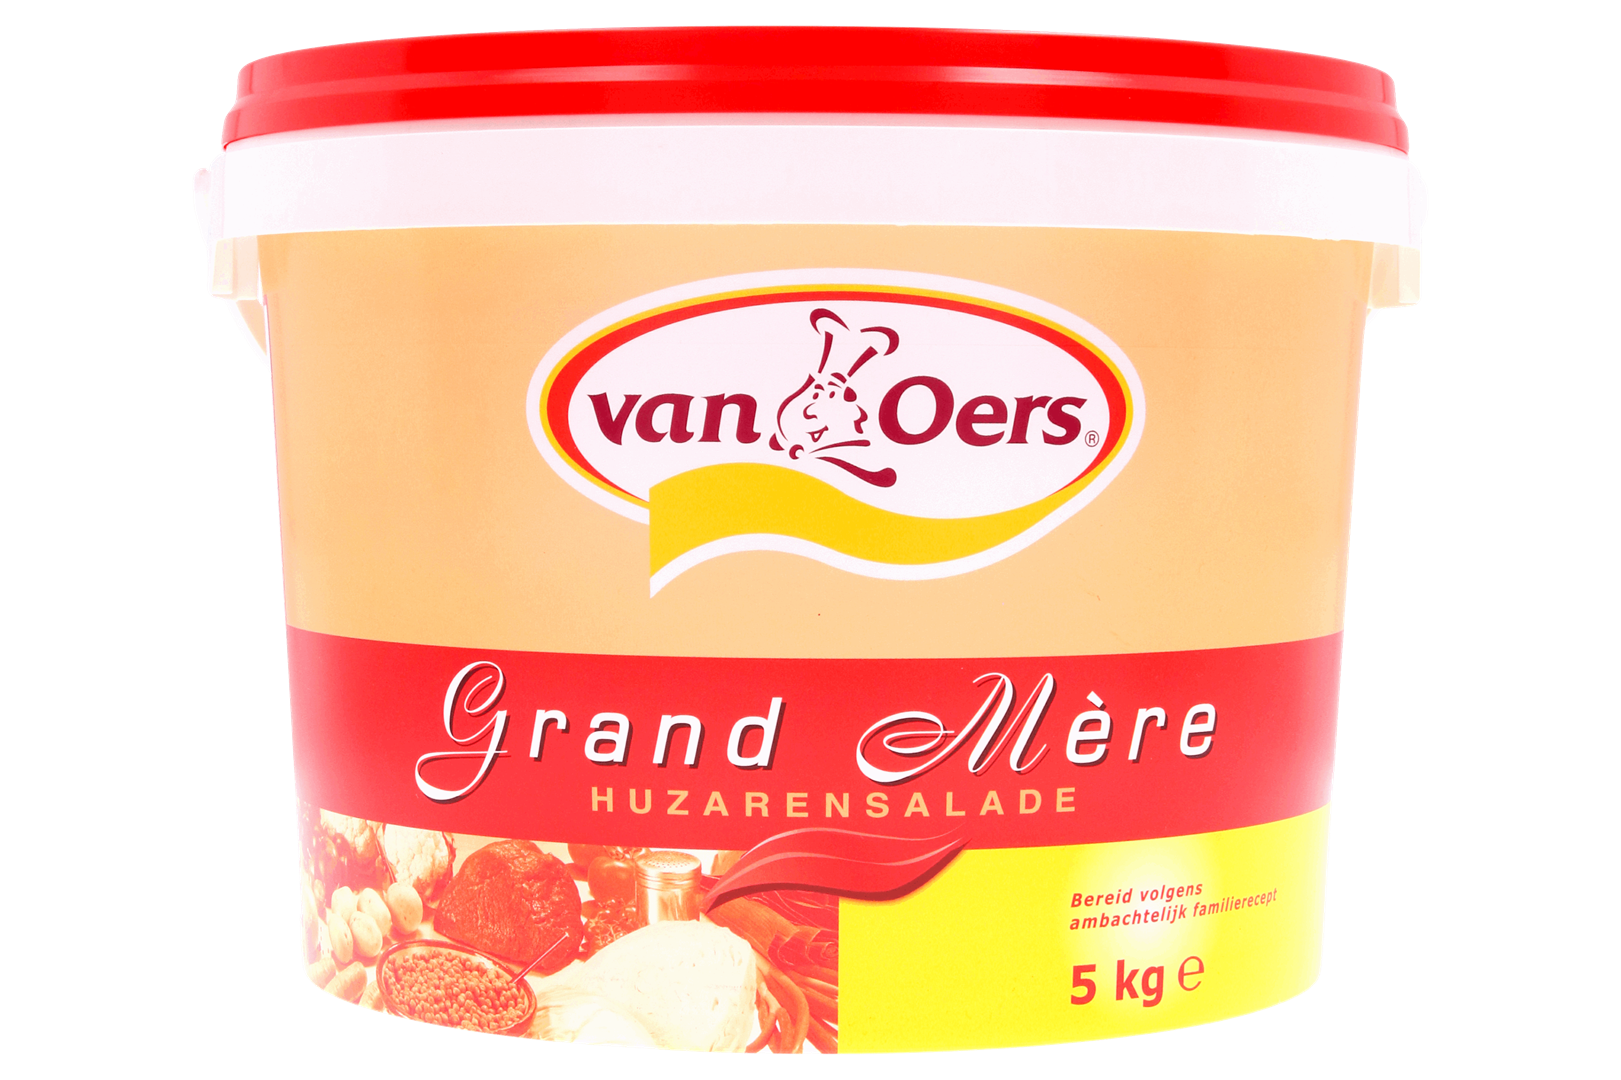 Productafbeelding Grand Mère Huzarensalade 5kg